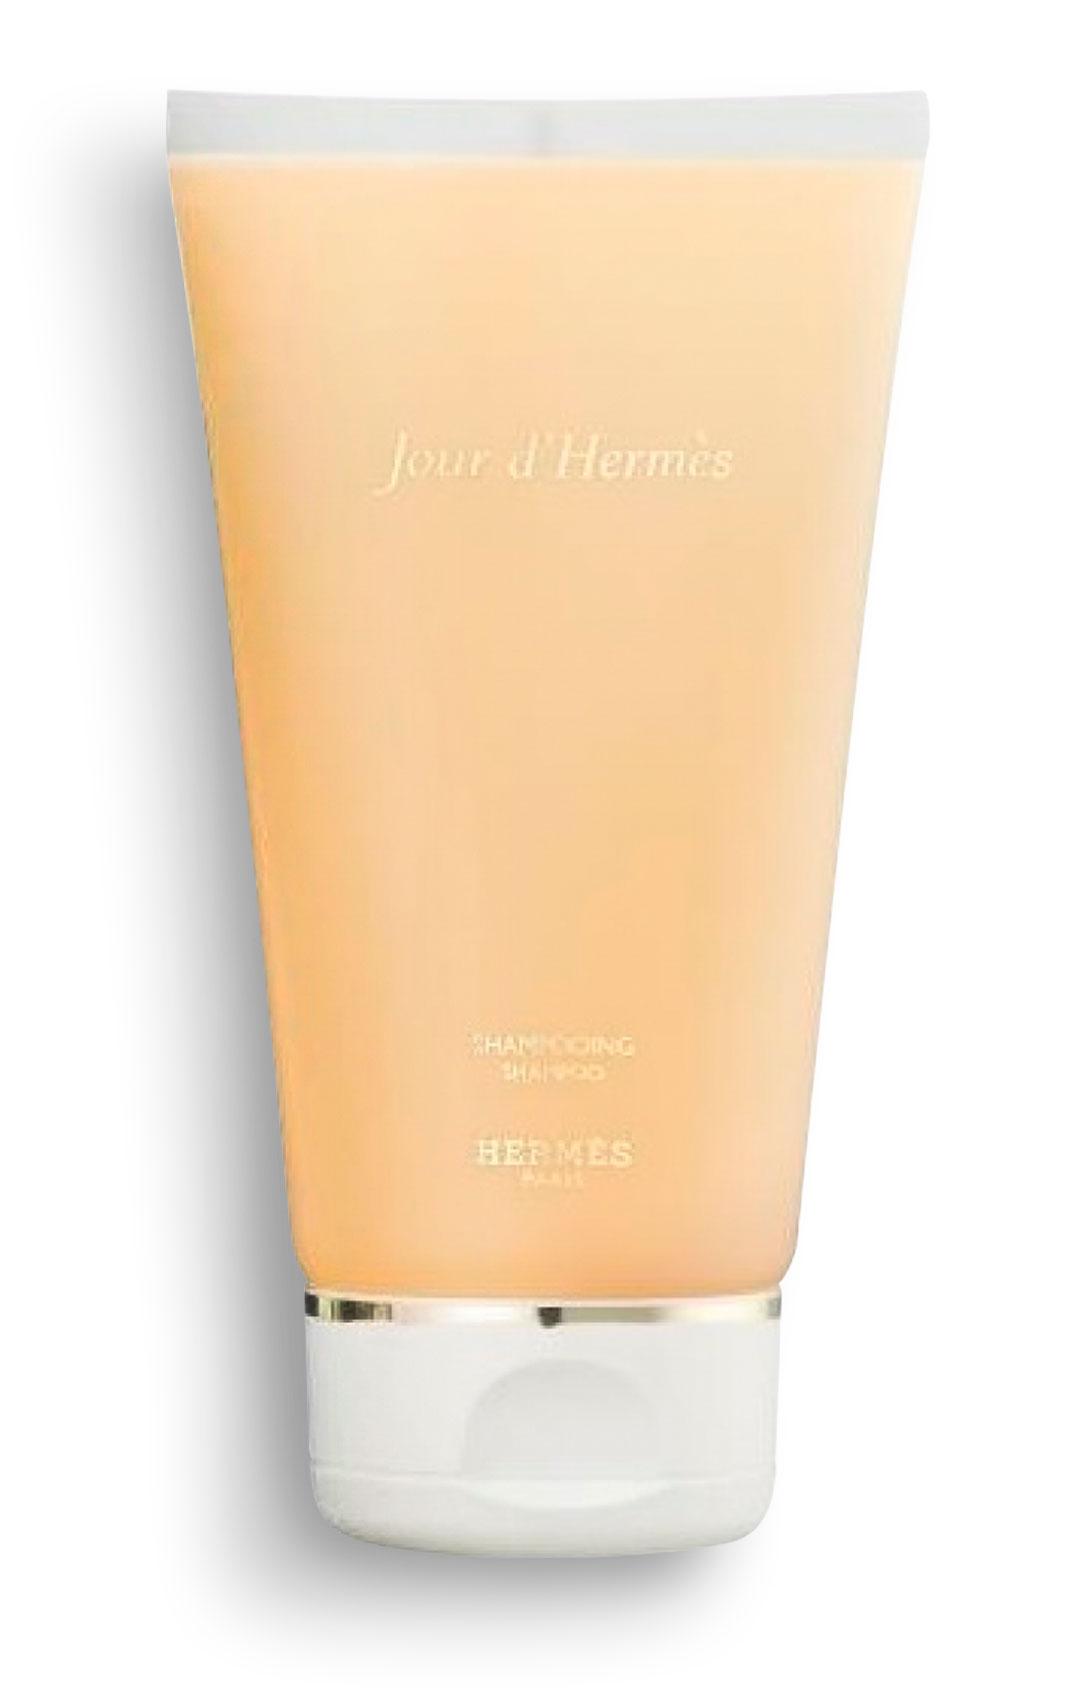 Hermès - Jour d'Hermès - Après-shampooing 150 ml.